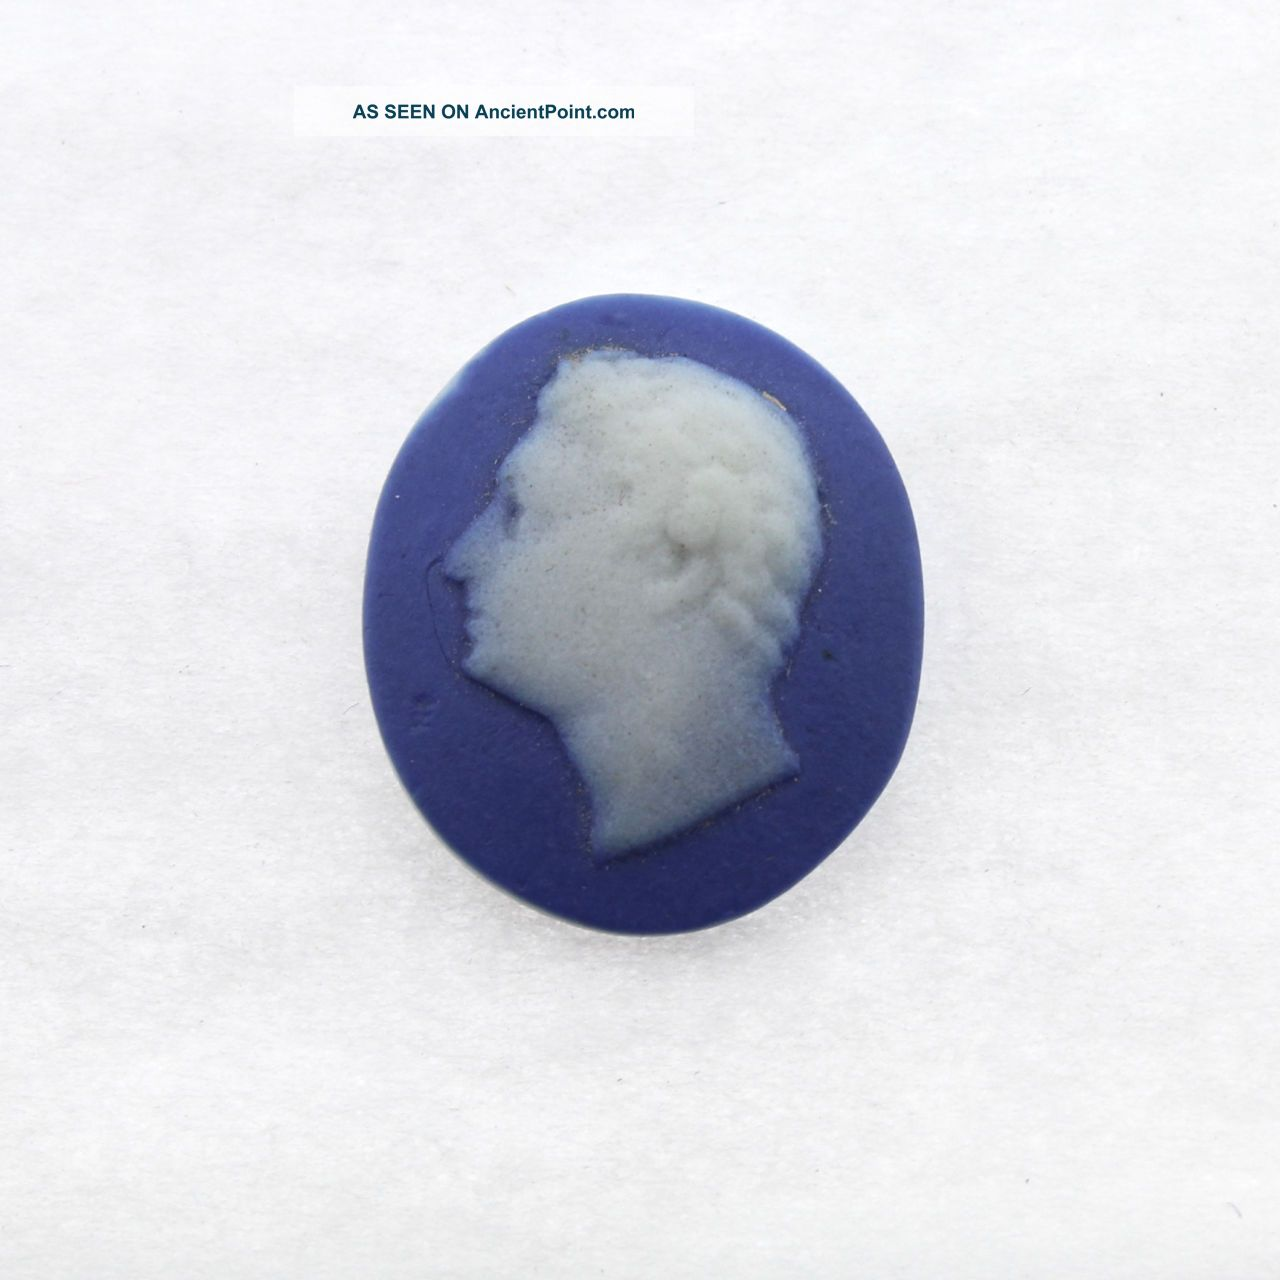 Antique Blue Jasper Medallion Of Julius Caesar - Button Jewelry Wedgwood ? Pc Buttons photo